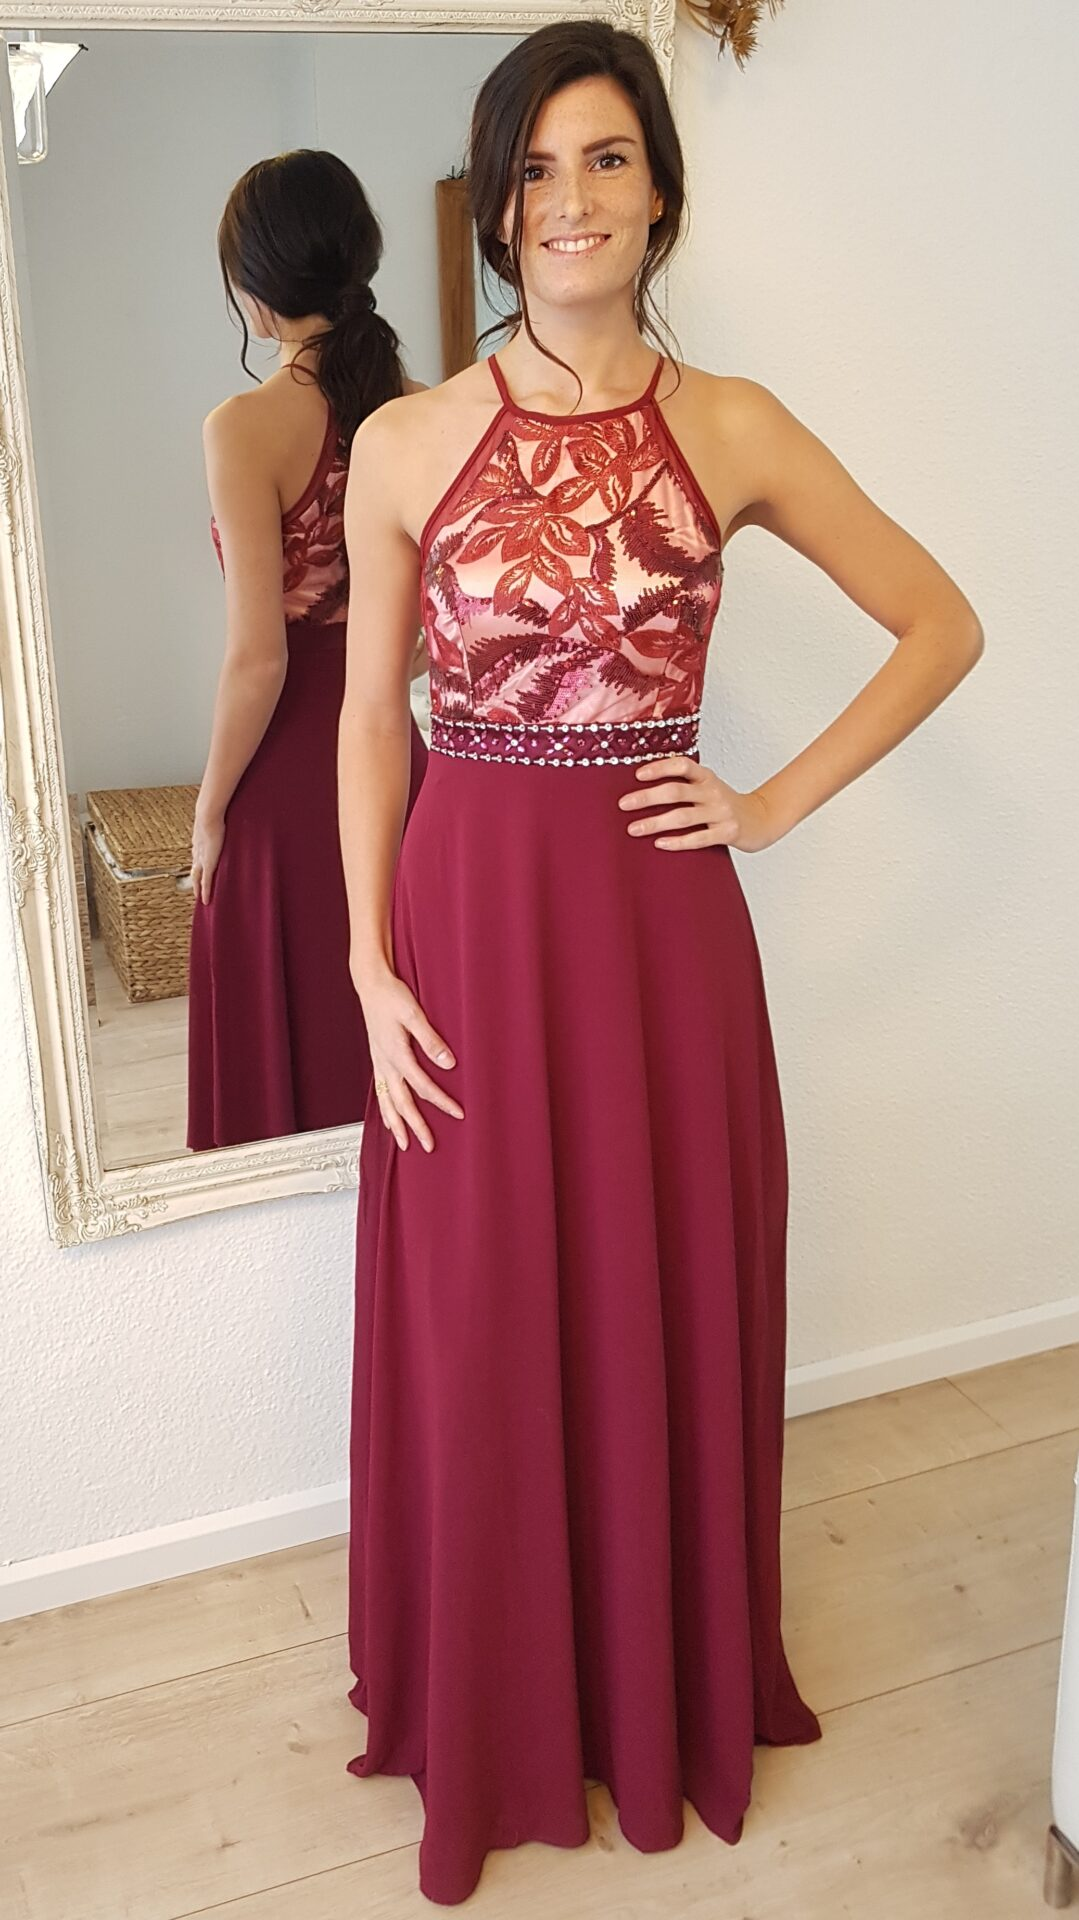 Rode jurk huidskleur